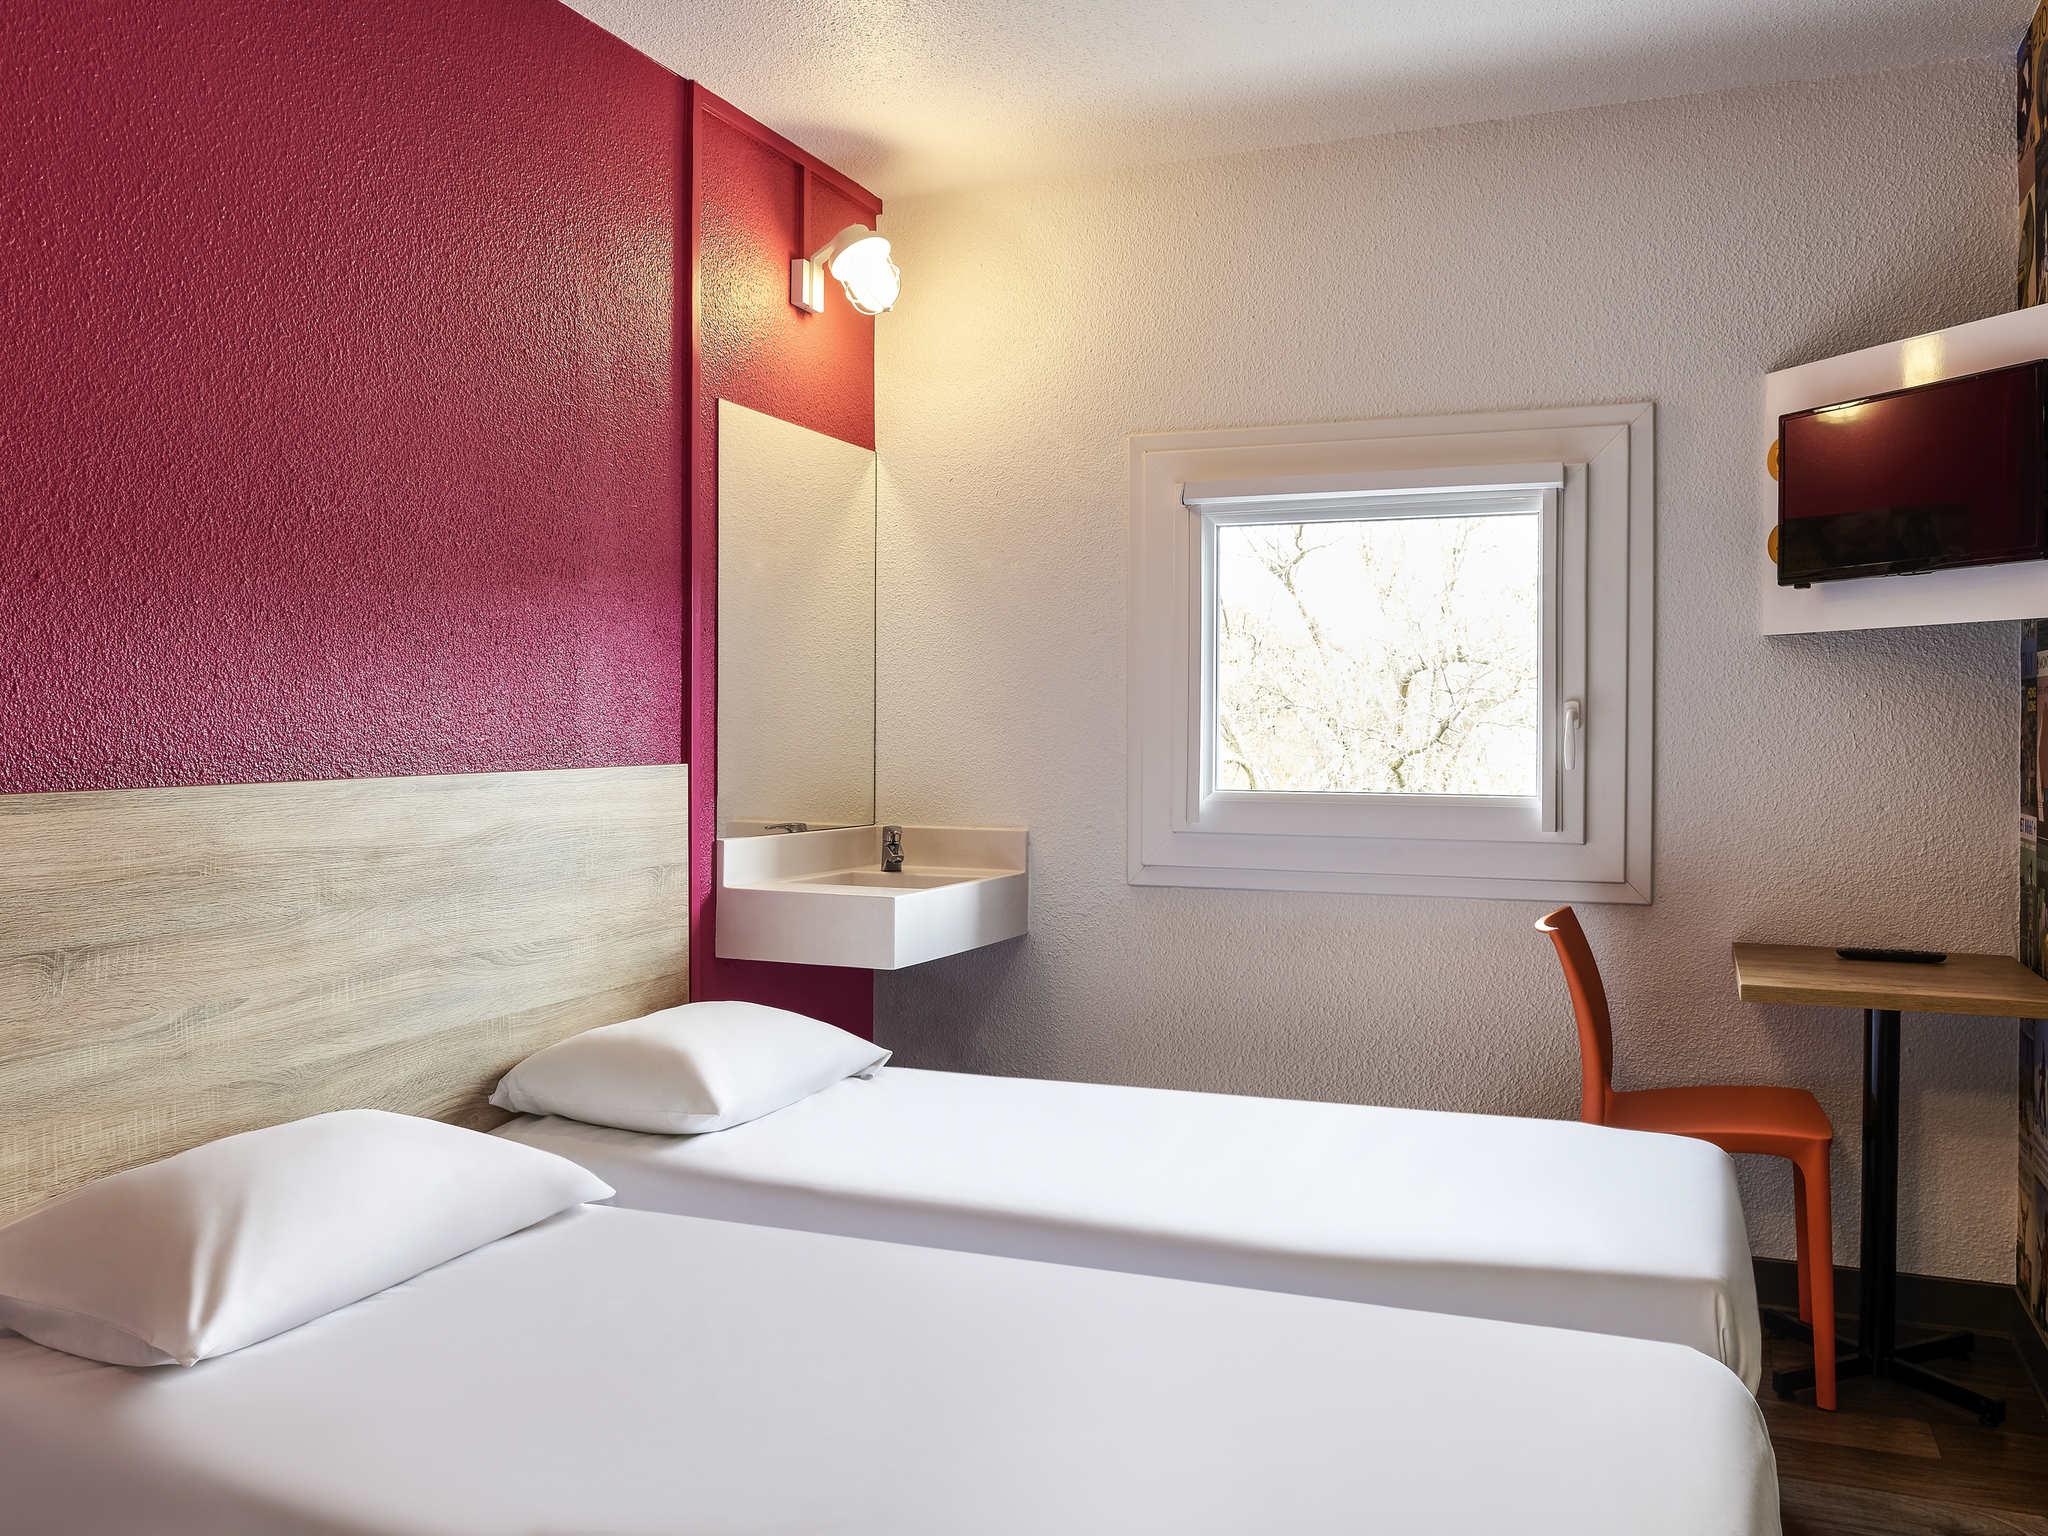 Hôtel - hotelF1 Aix-en-Provence